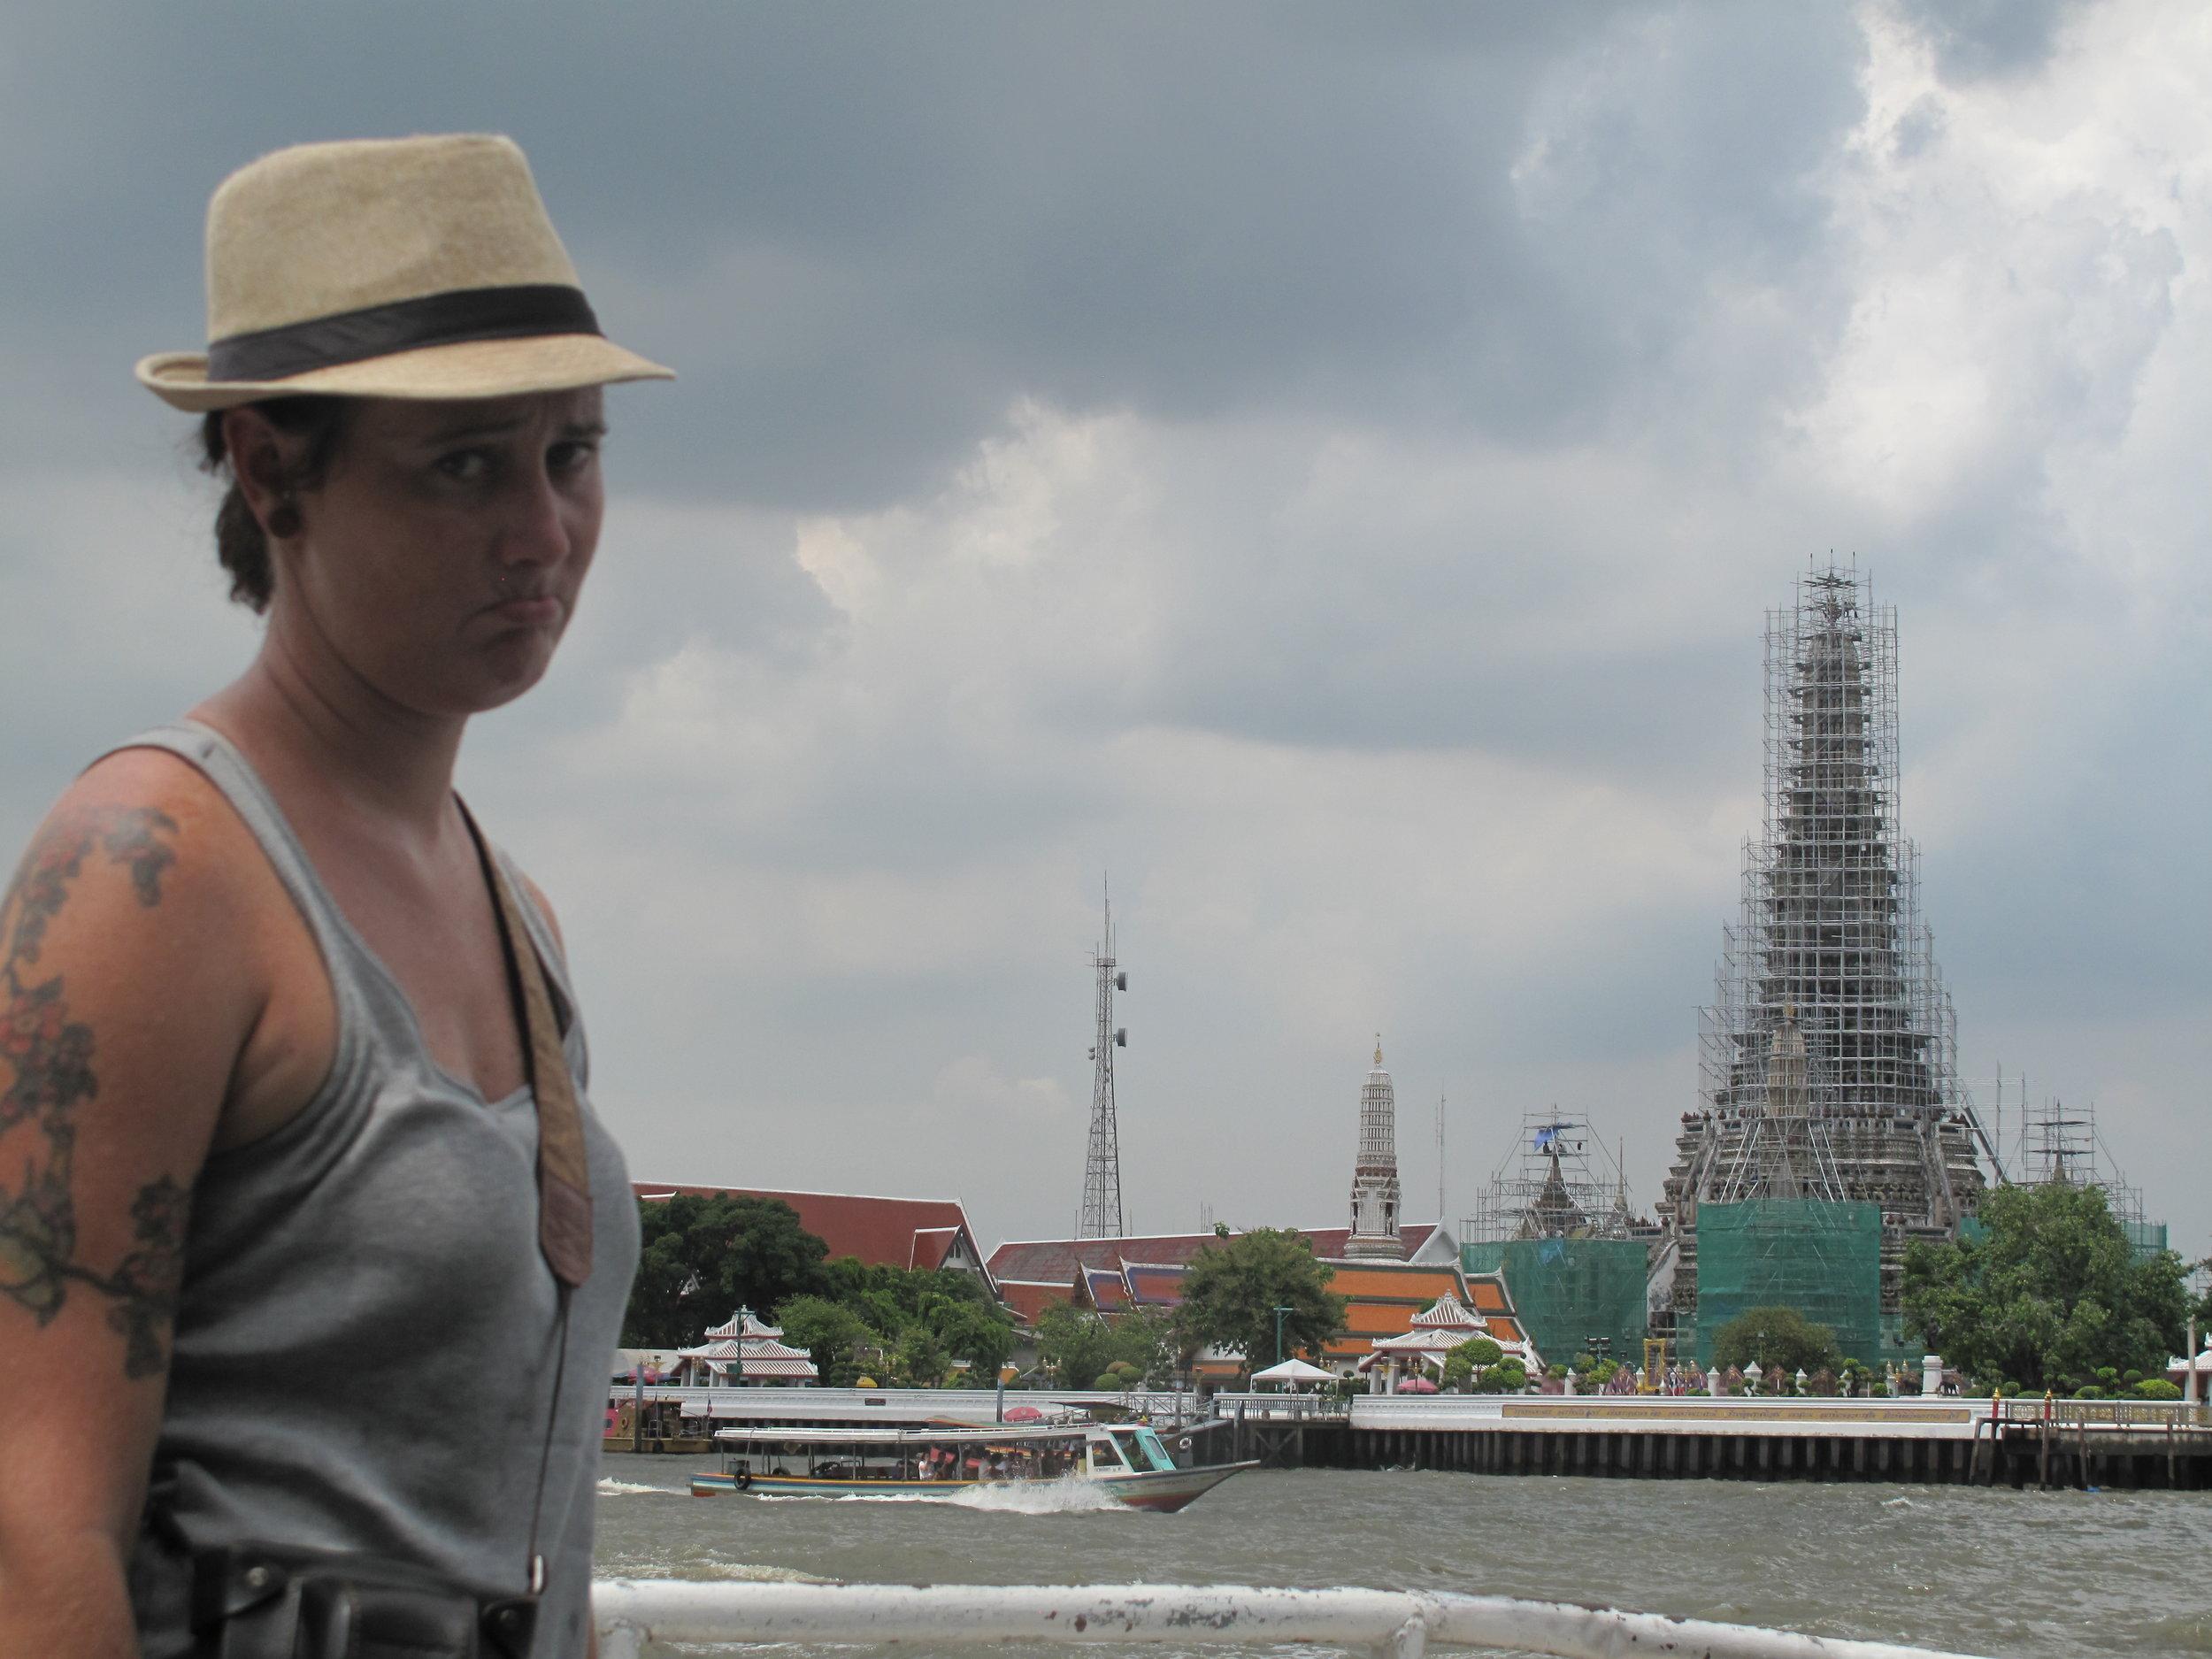 Wat Arun, covered in scaffolding